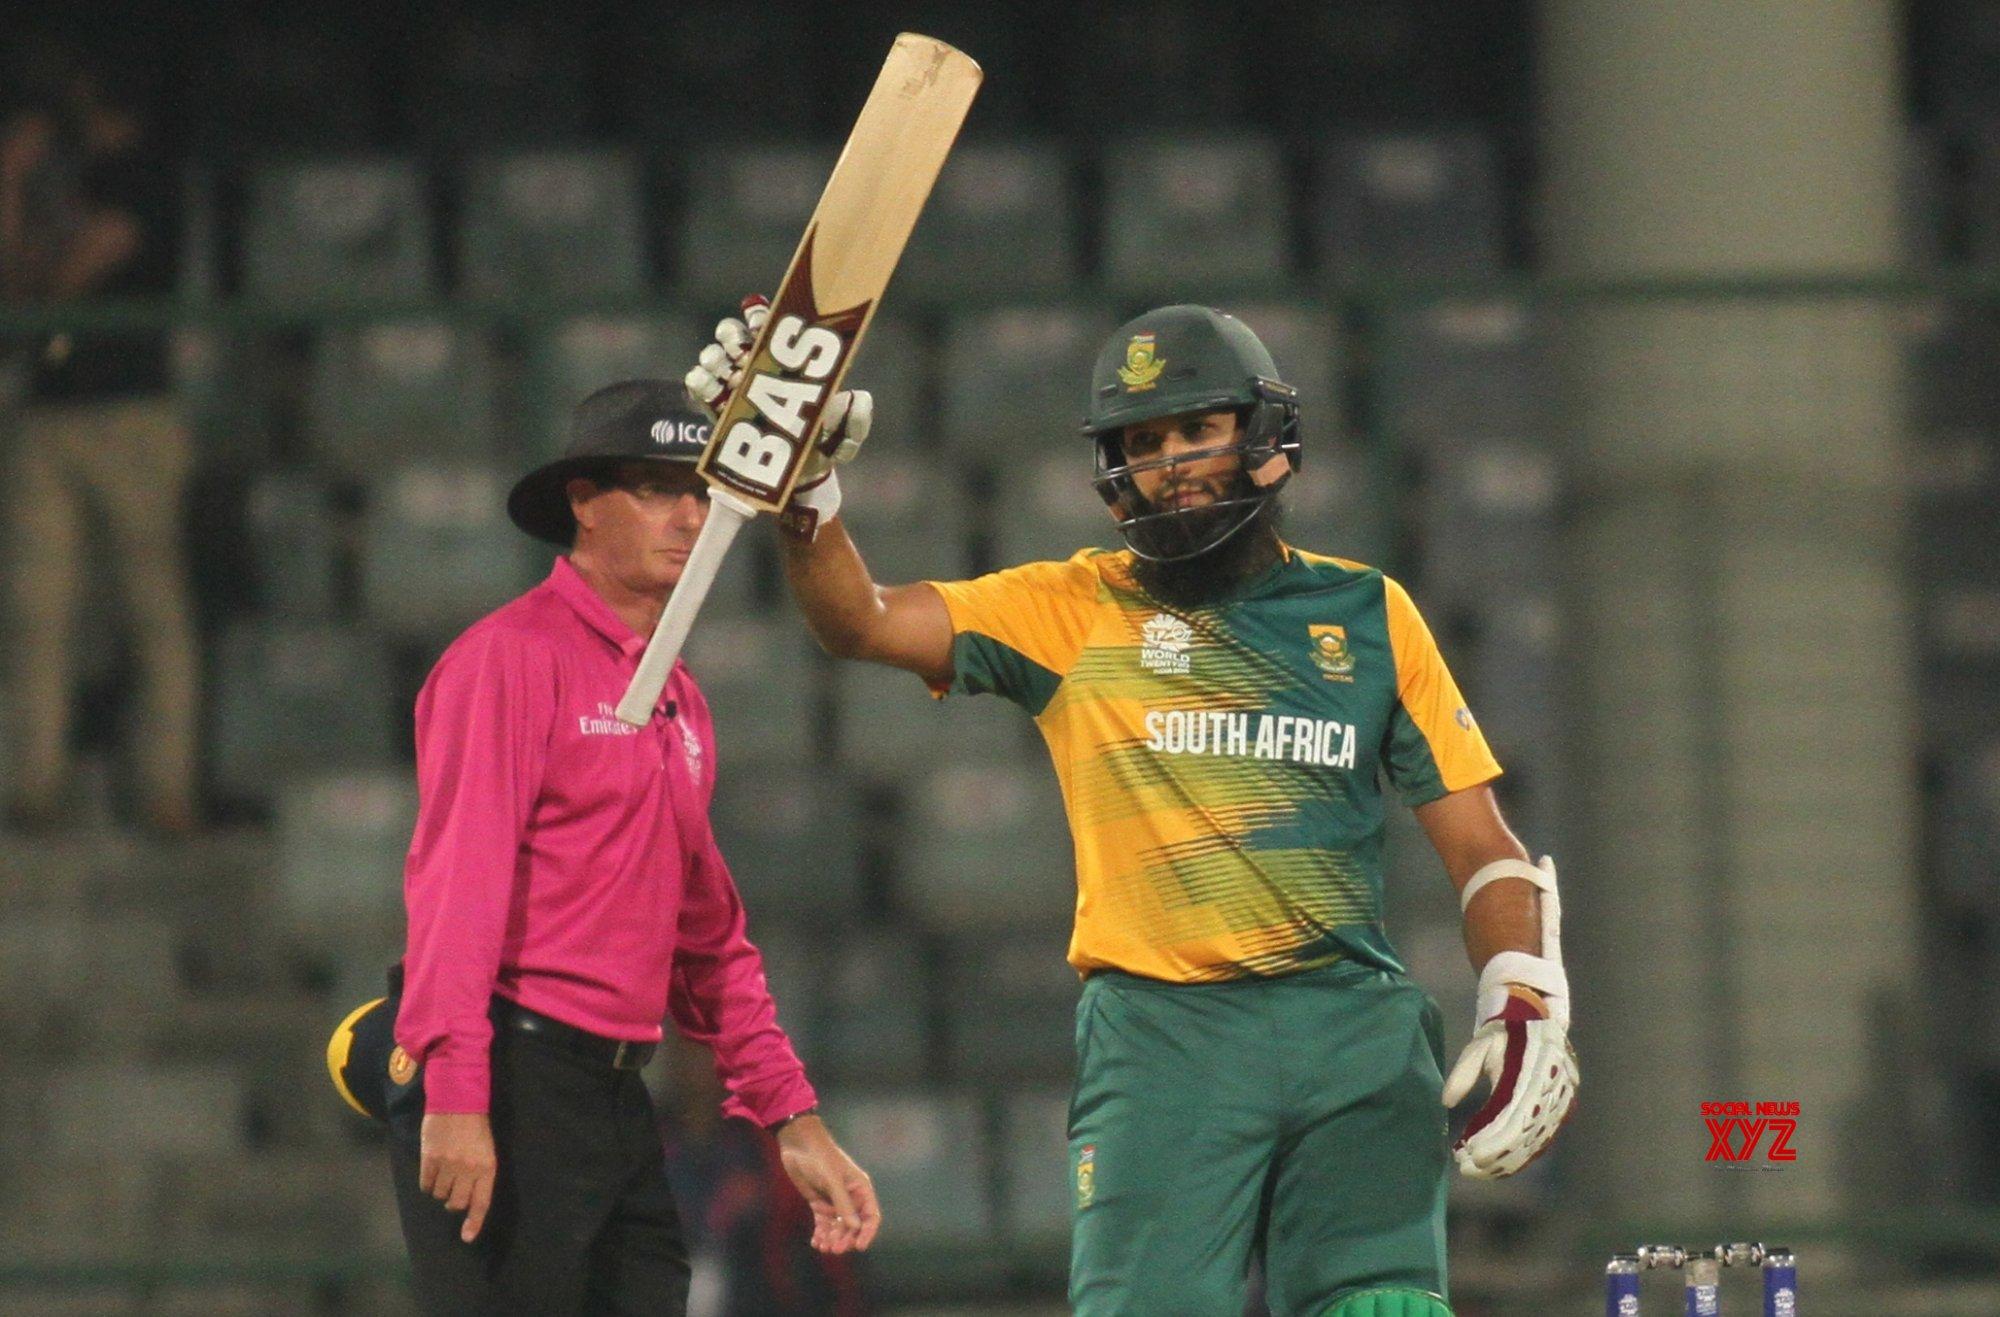 Hashim Amla set to sign for Surrey